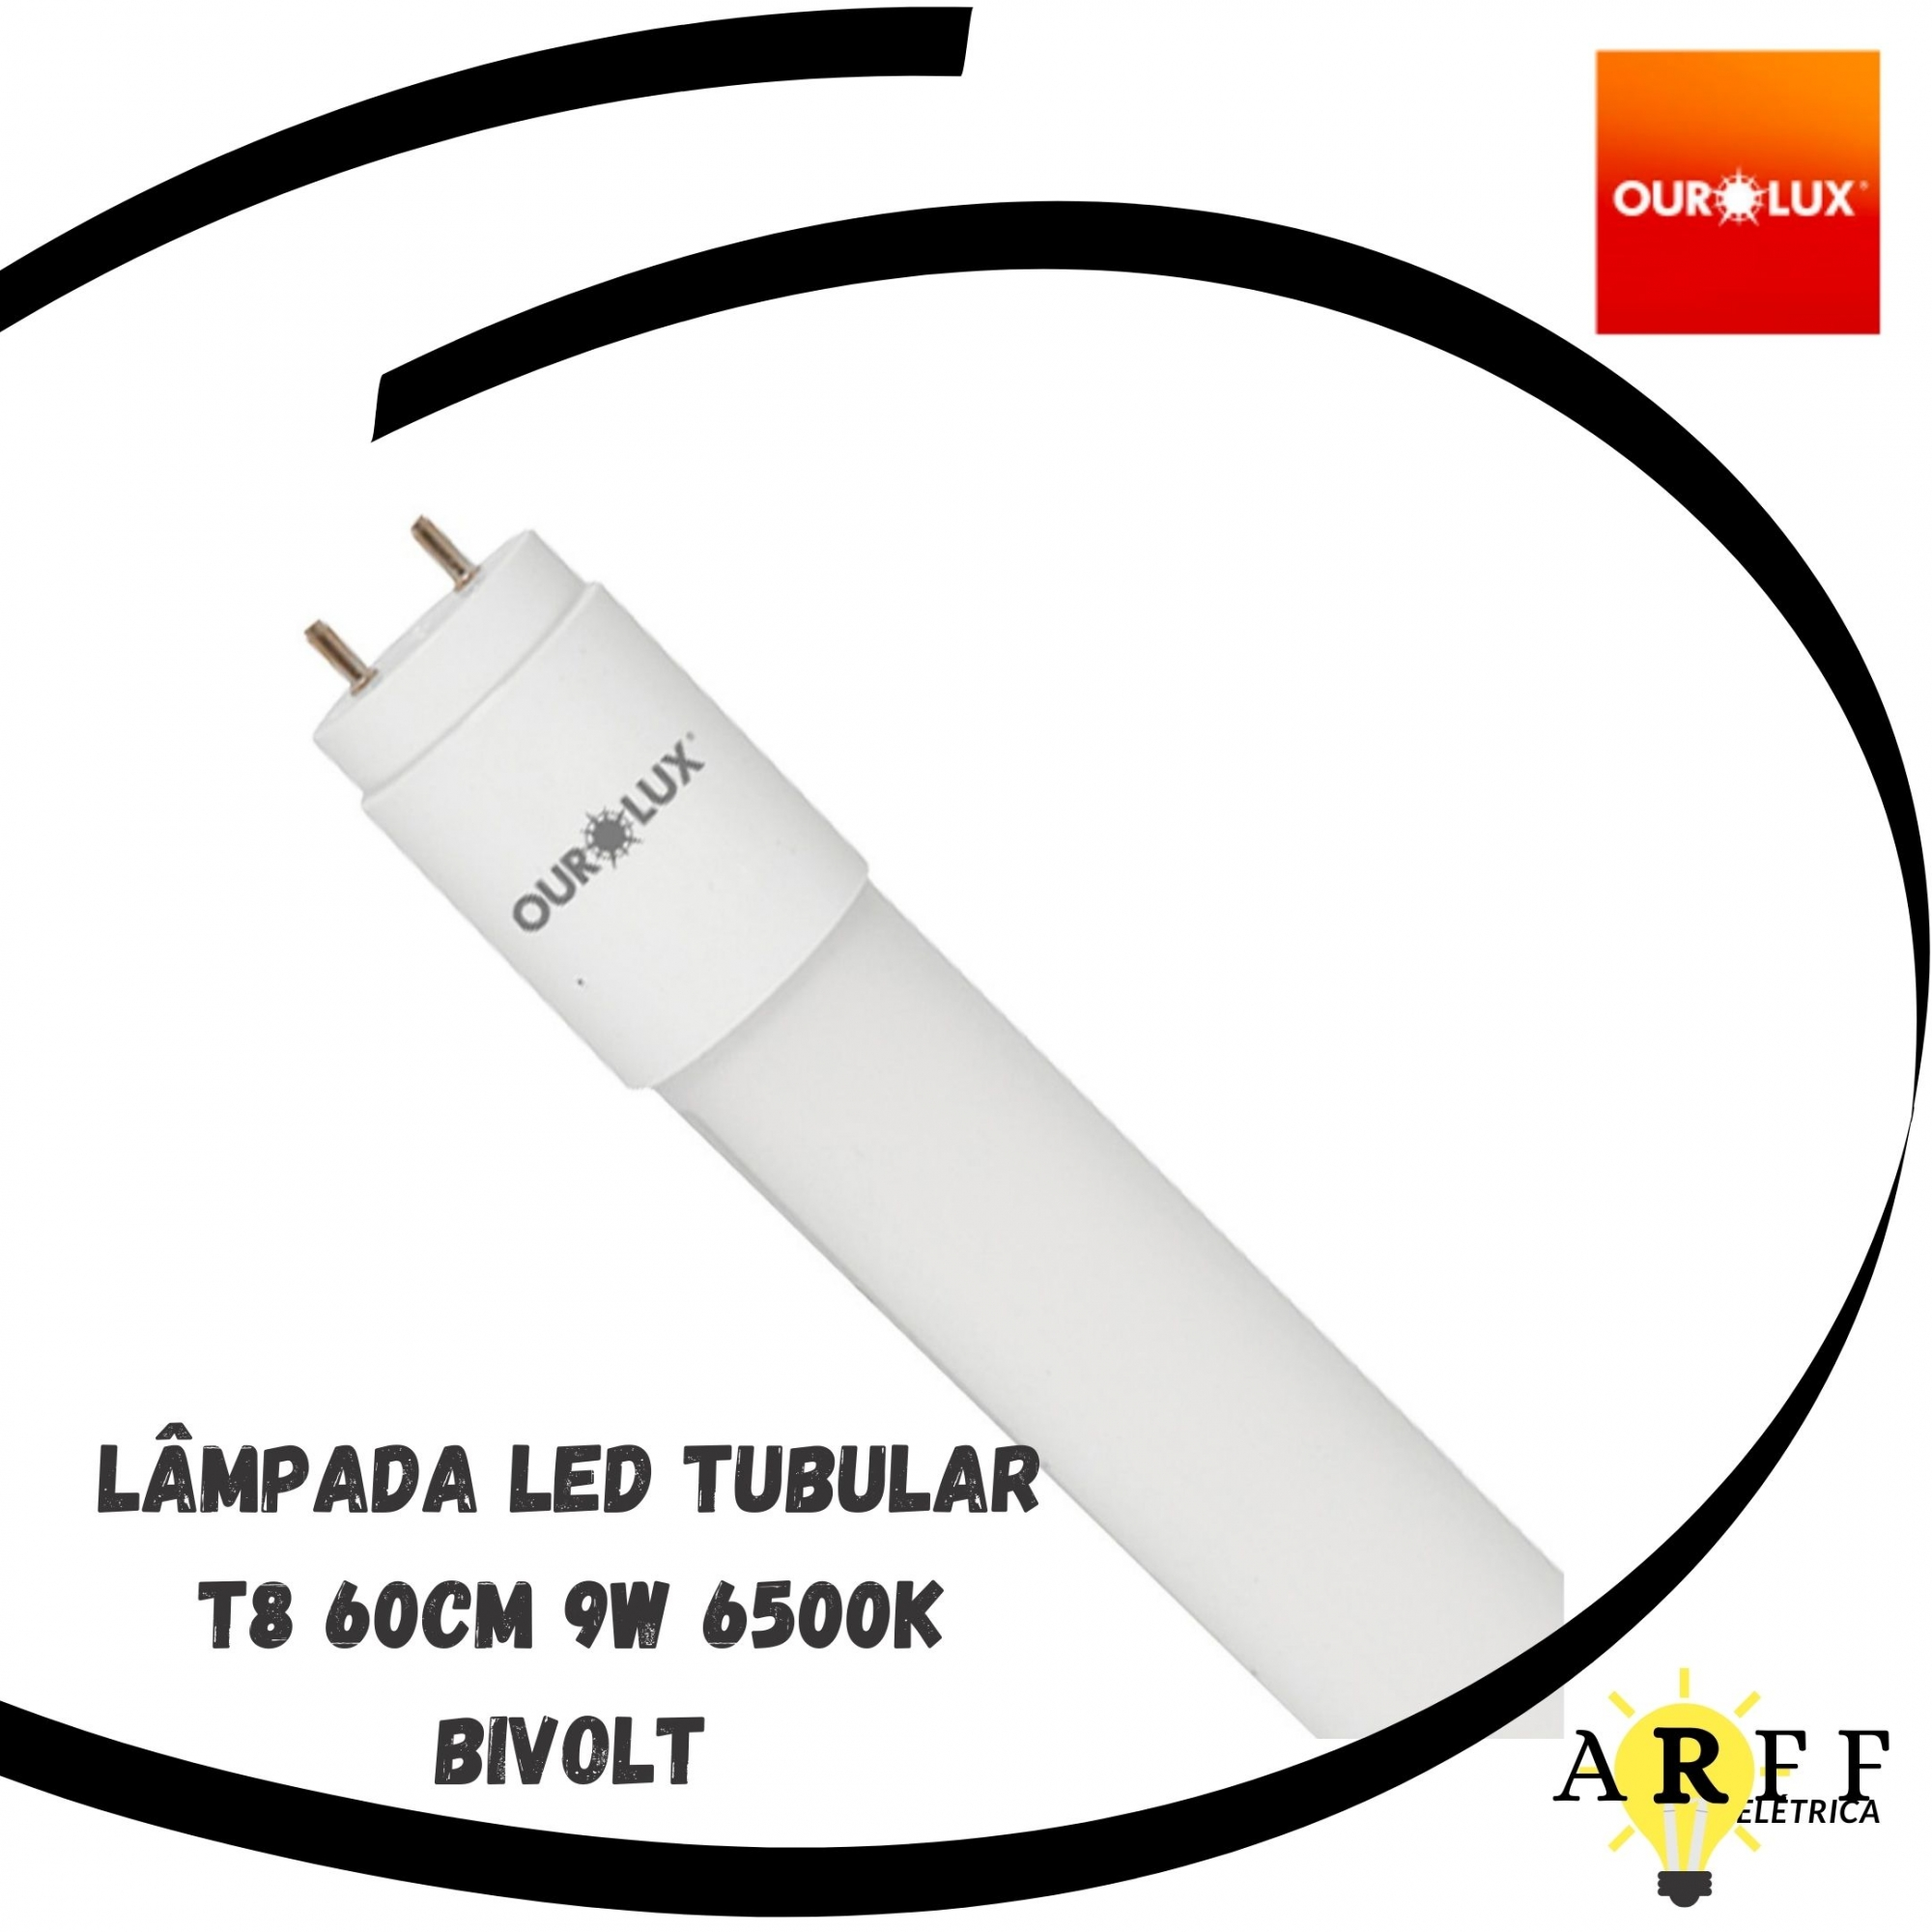 Lâmpada Led Tubular T8 60cm 9W 6500k Bivolt OUROLUX